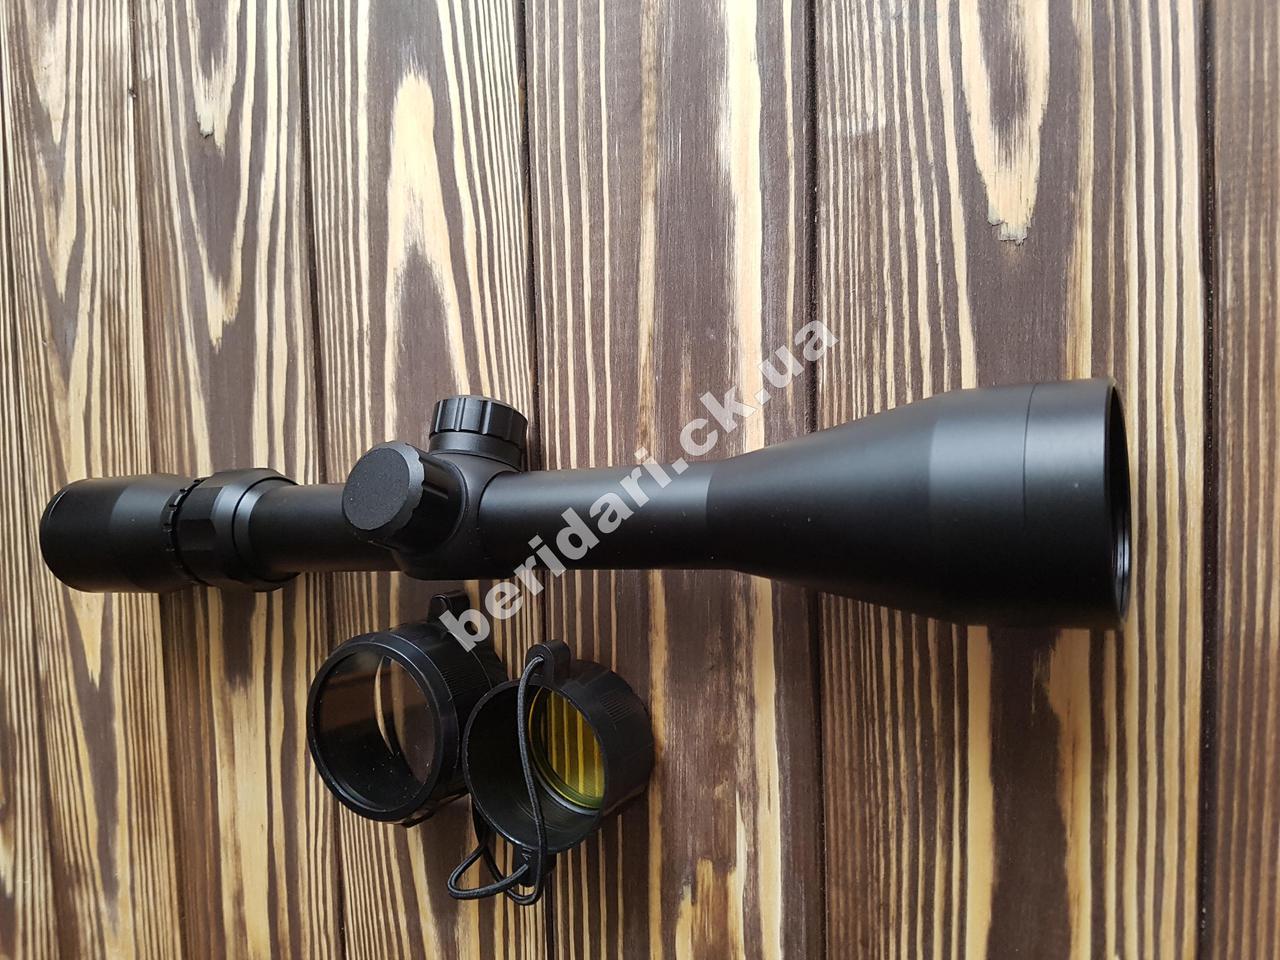 Оптический прицел Tasco 3-9x40